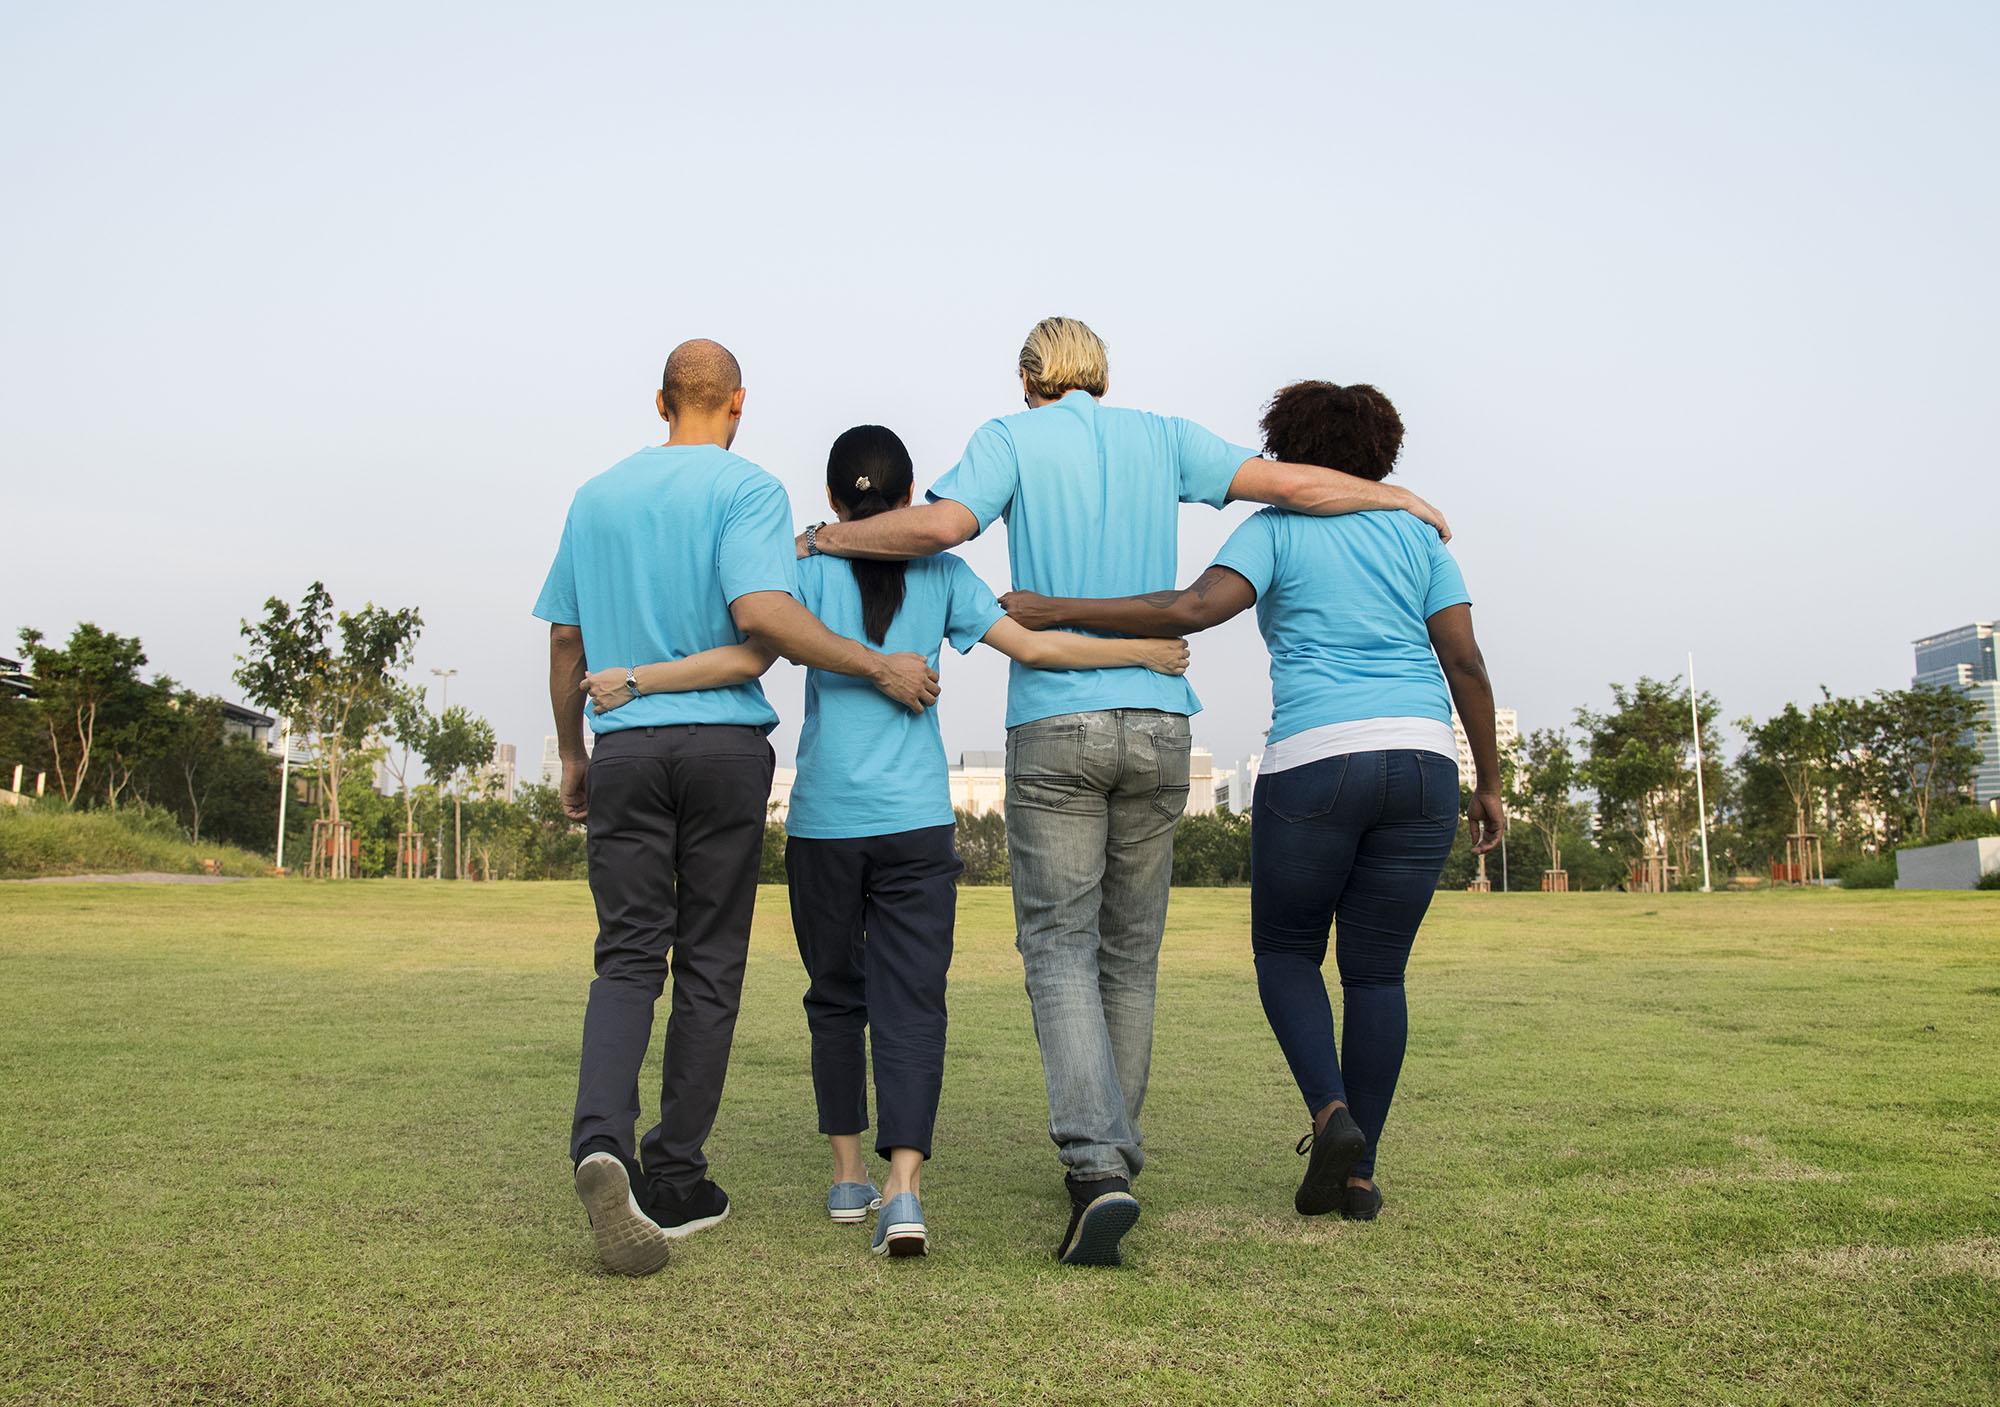 4 people walking together